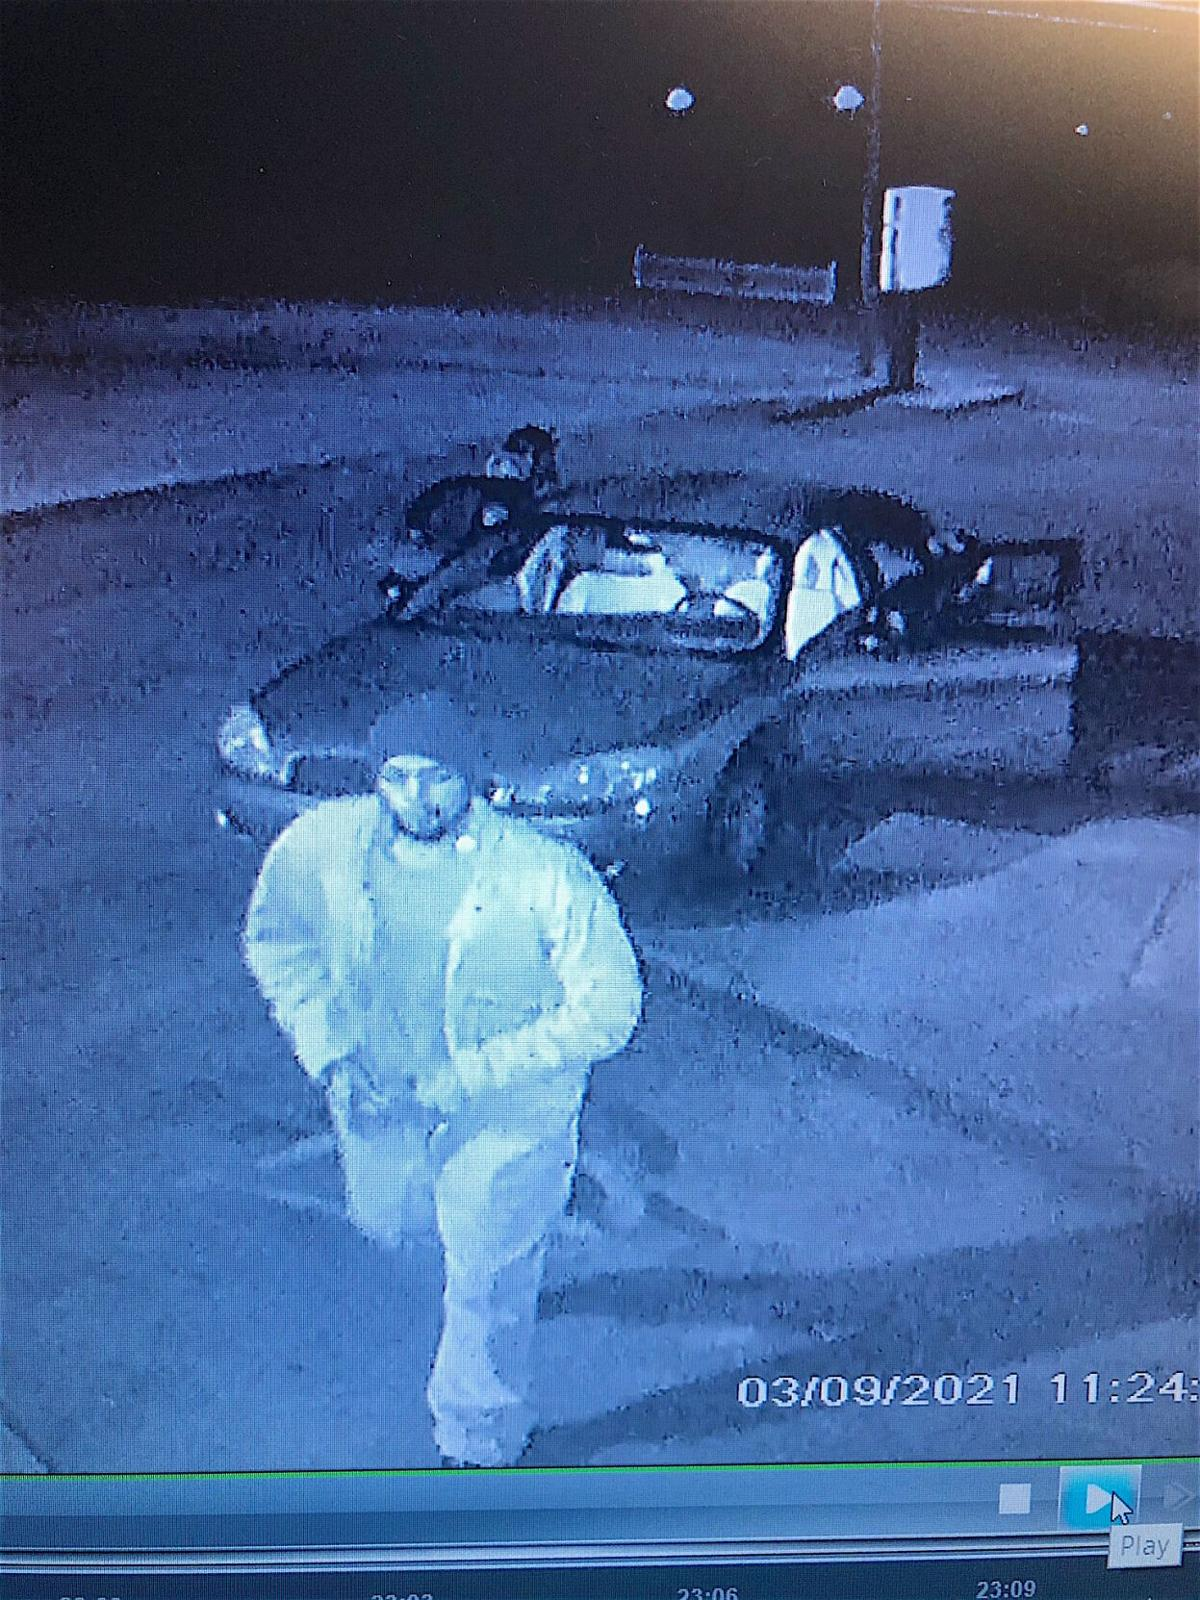 Church asks for help identifying burglars